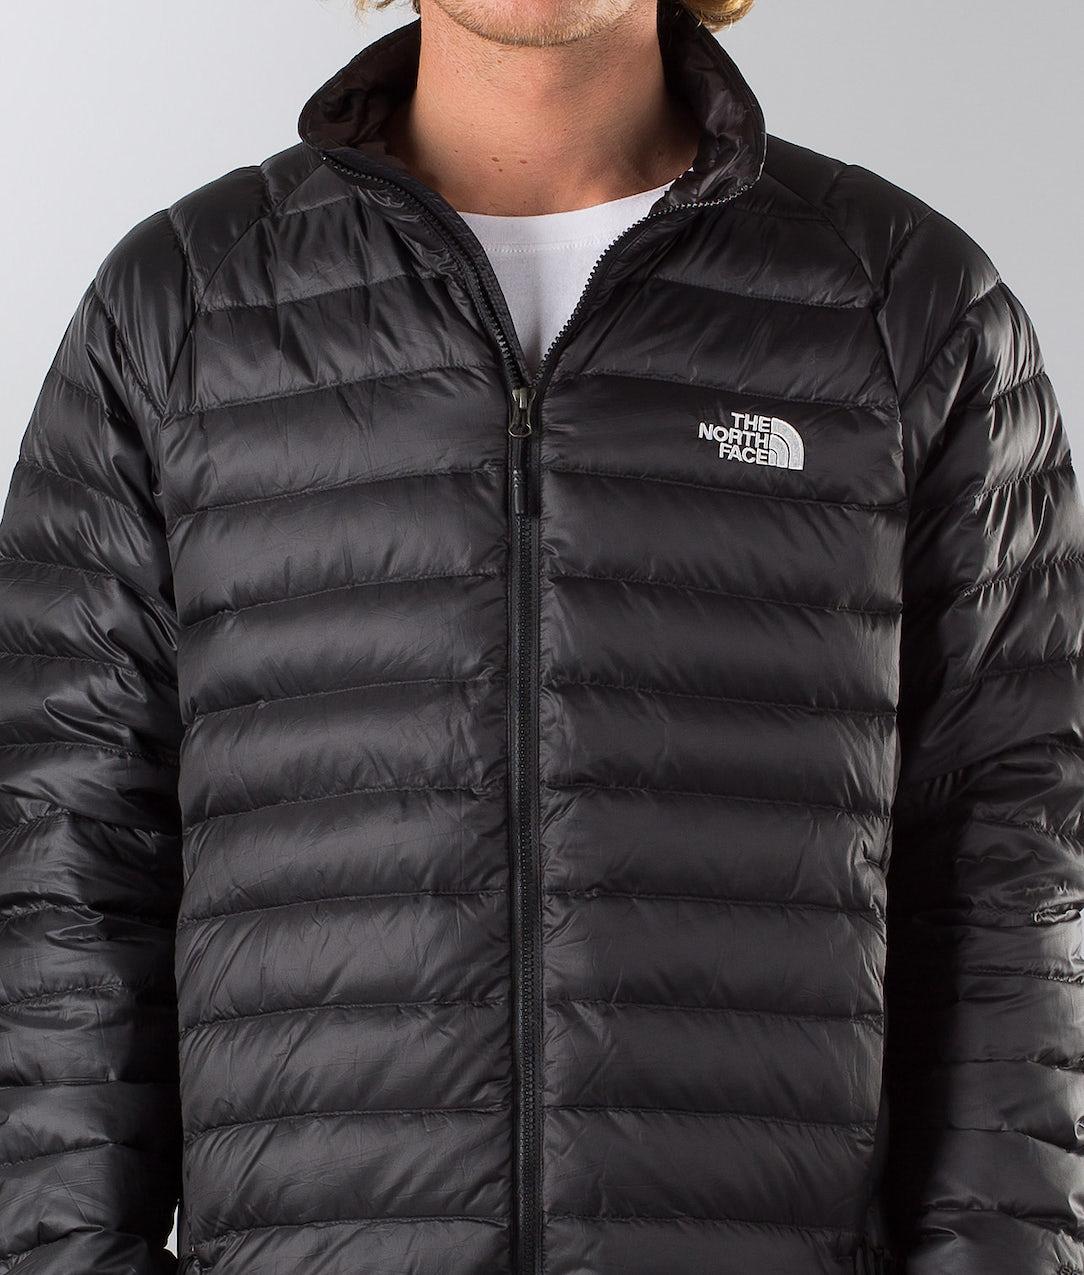 snelle levering frisse stijlen nieuw concept The North Face Trevail Jacket tnf black/tnf black